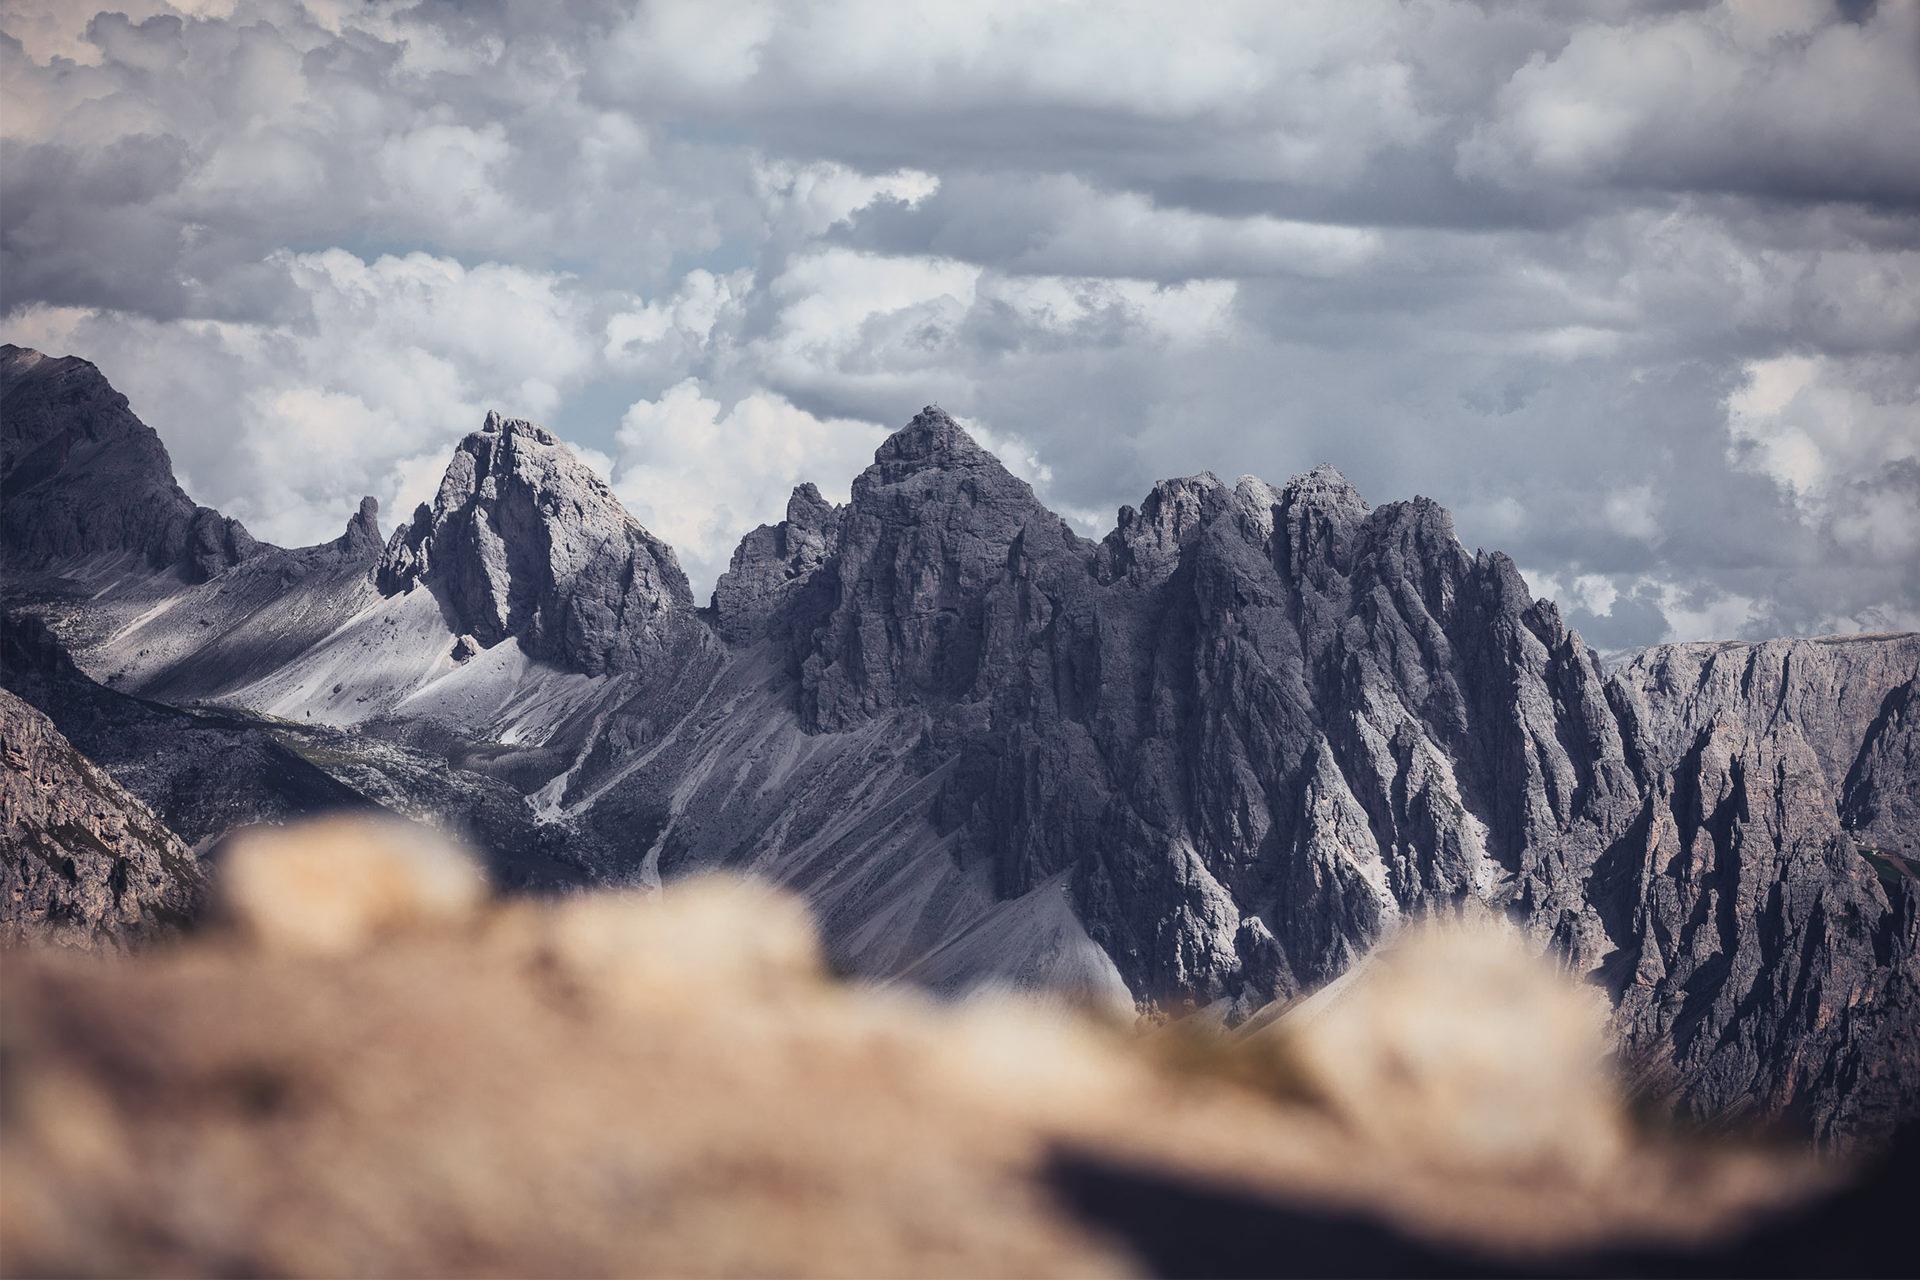 val-gardena-gebirge-suedtirol-alpen-kampagne